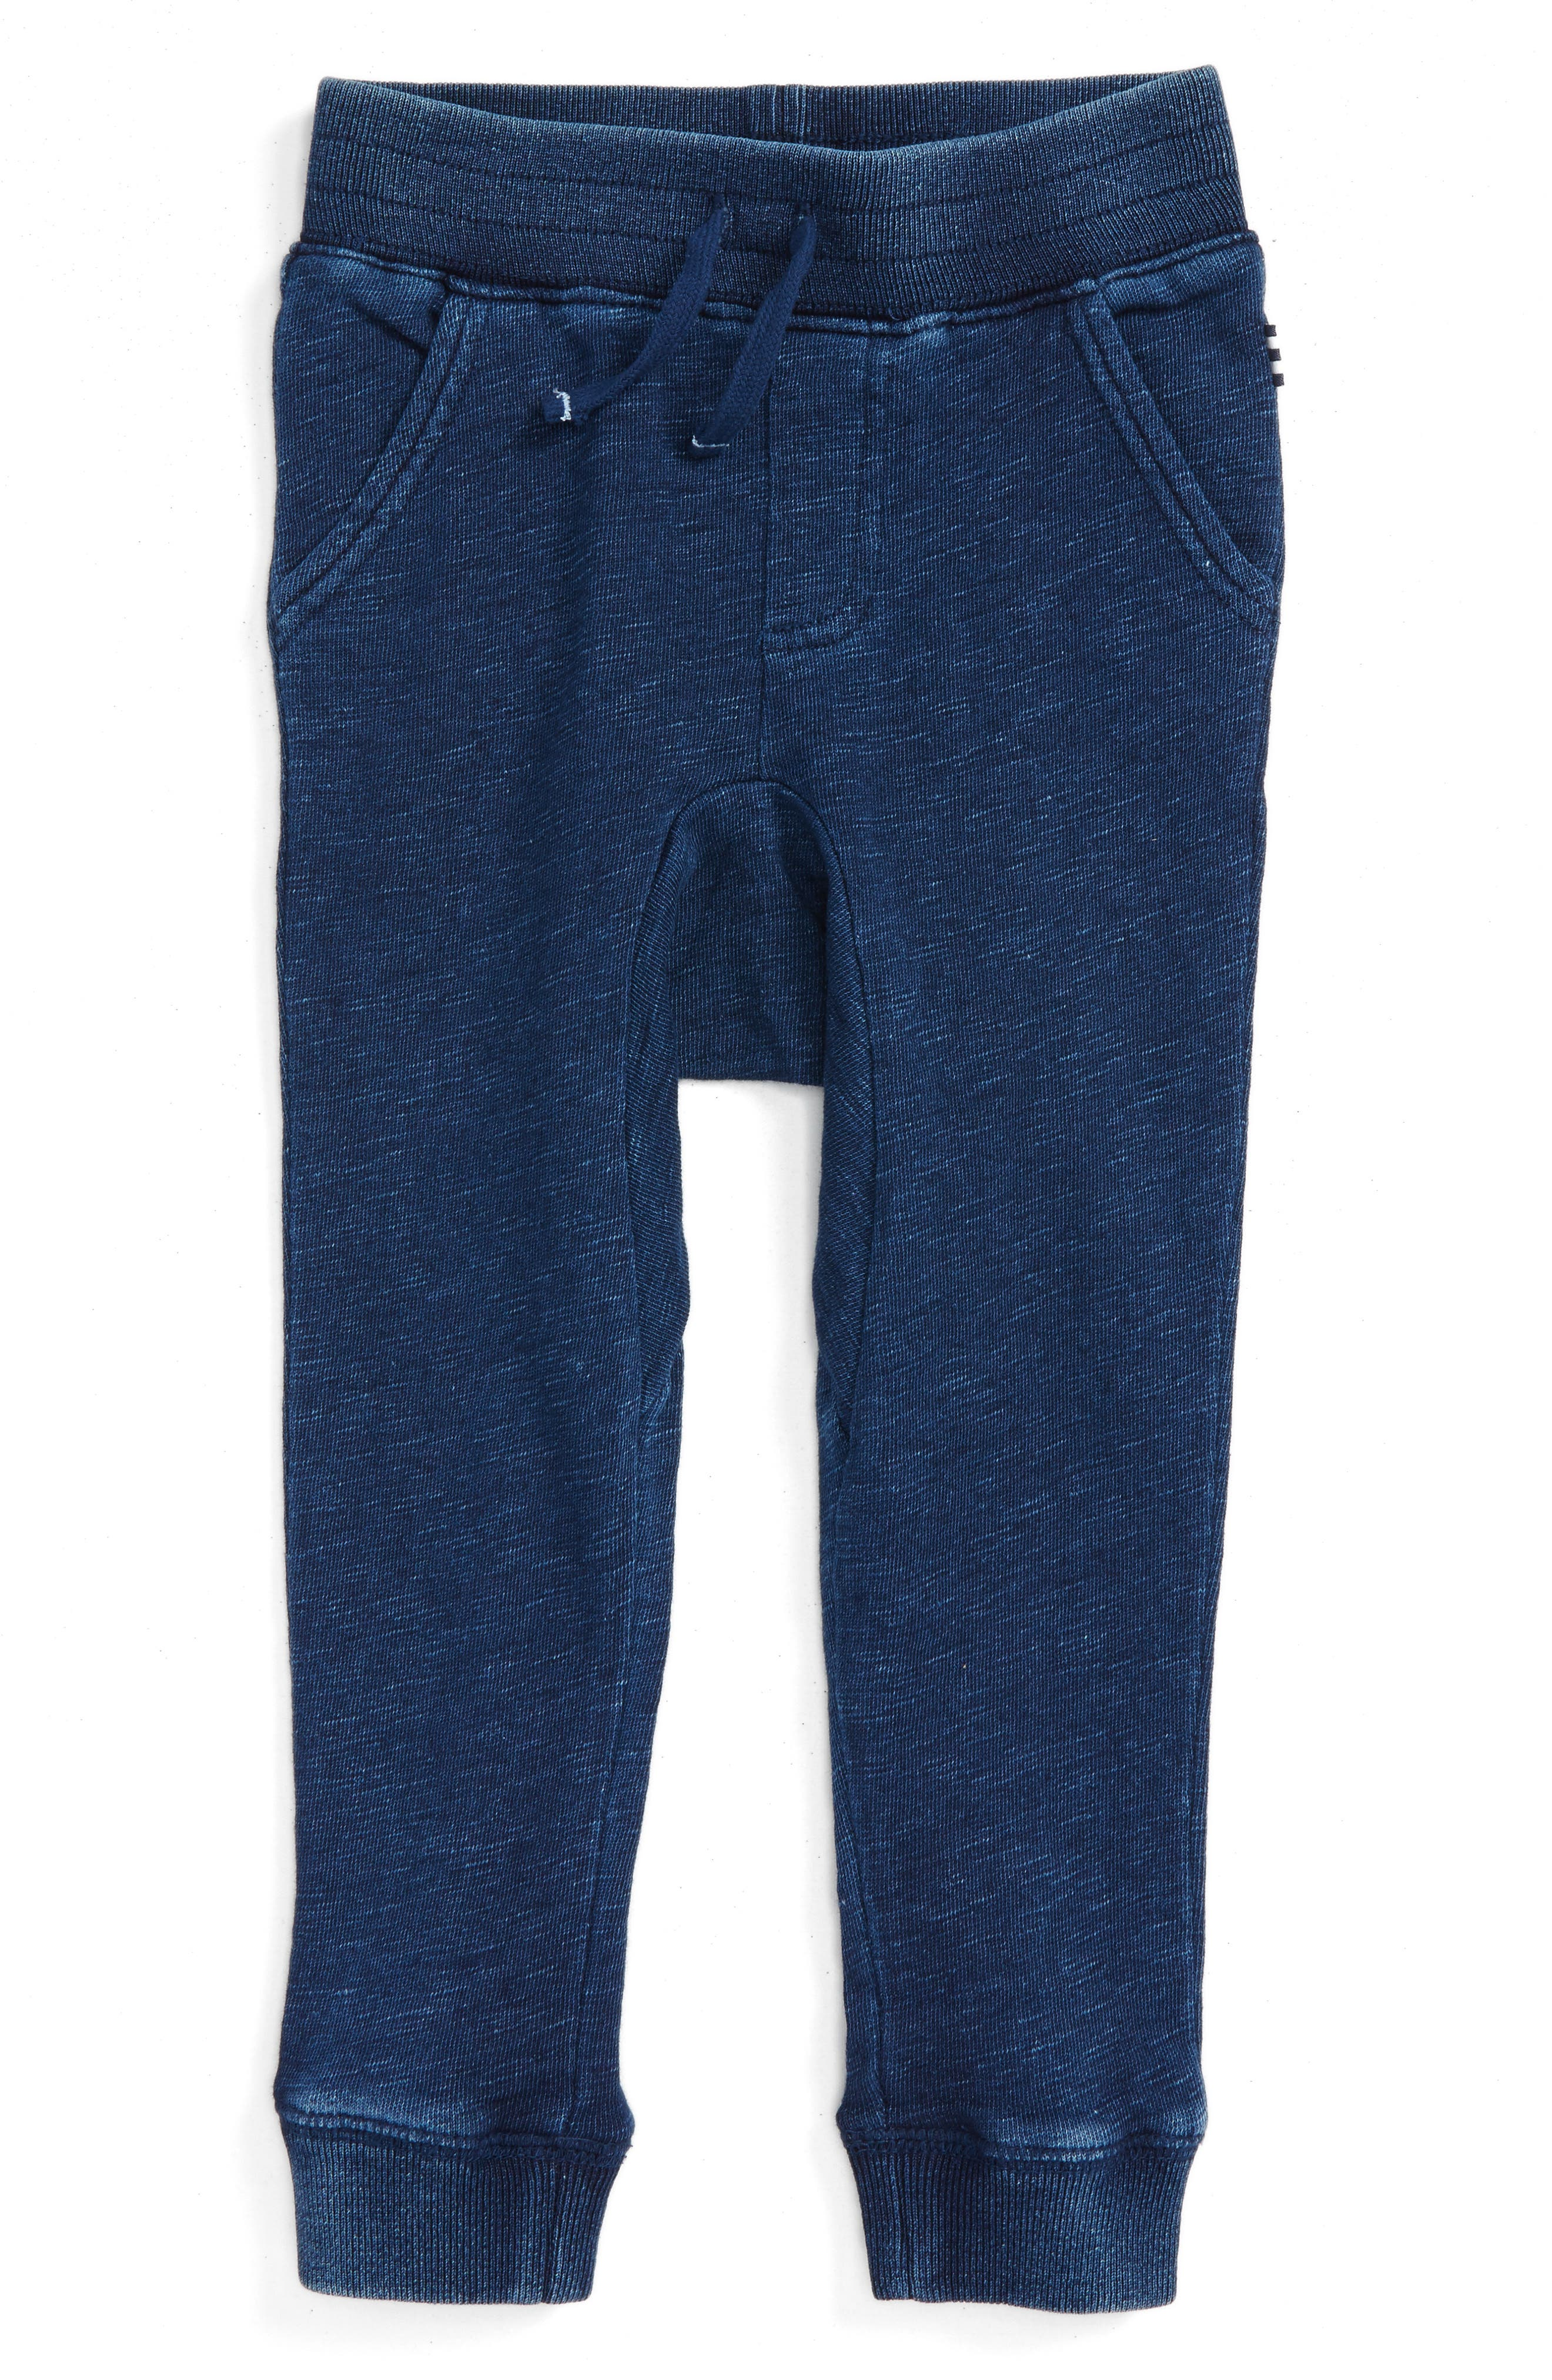 Double Knit Jogger Pants,                             Main thumbnail 1, color,                             Dark Stone